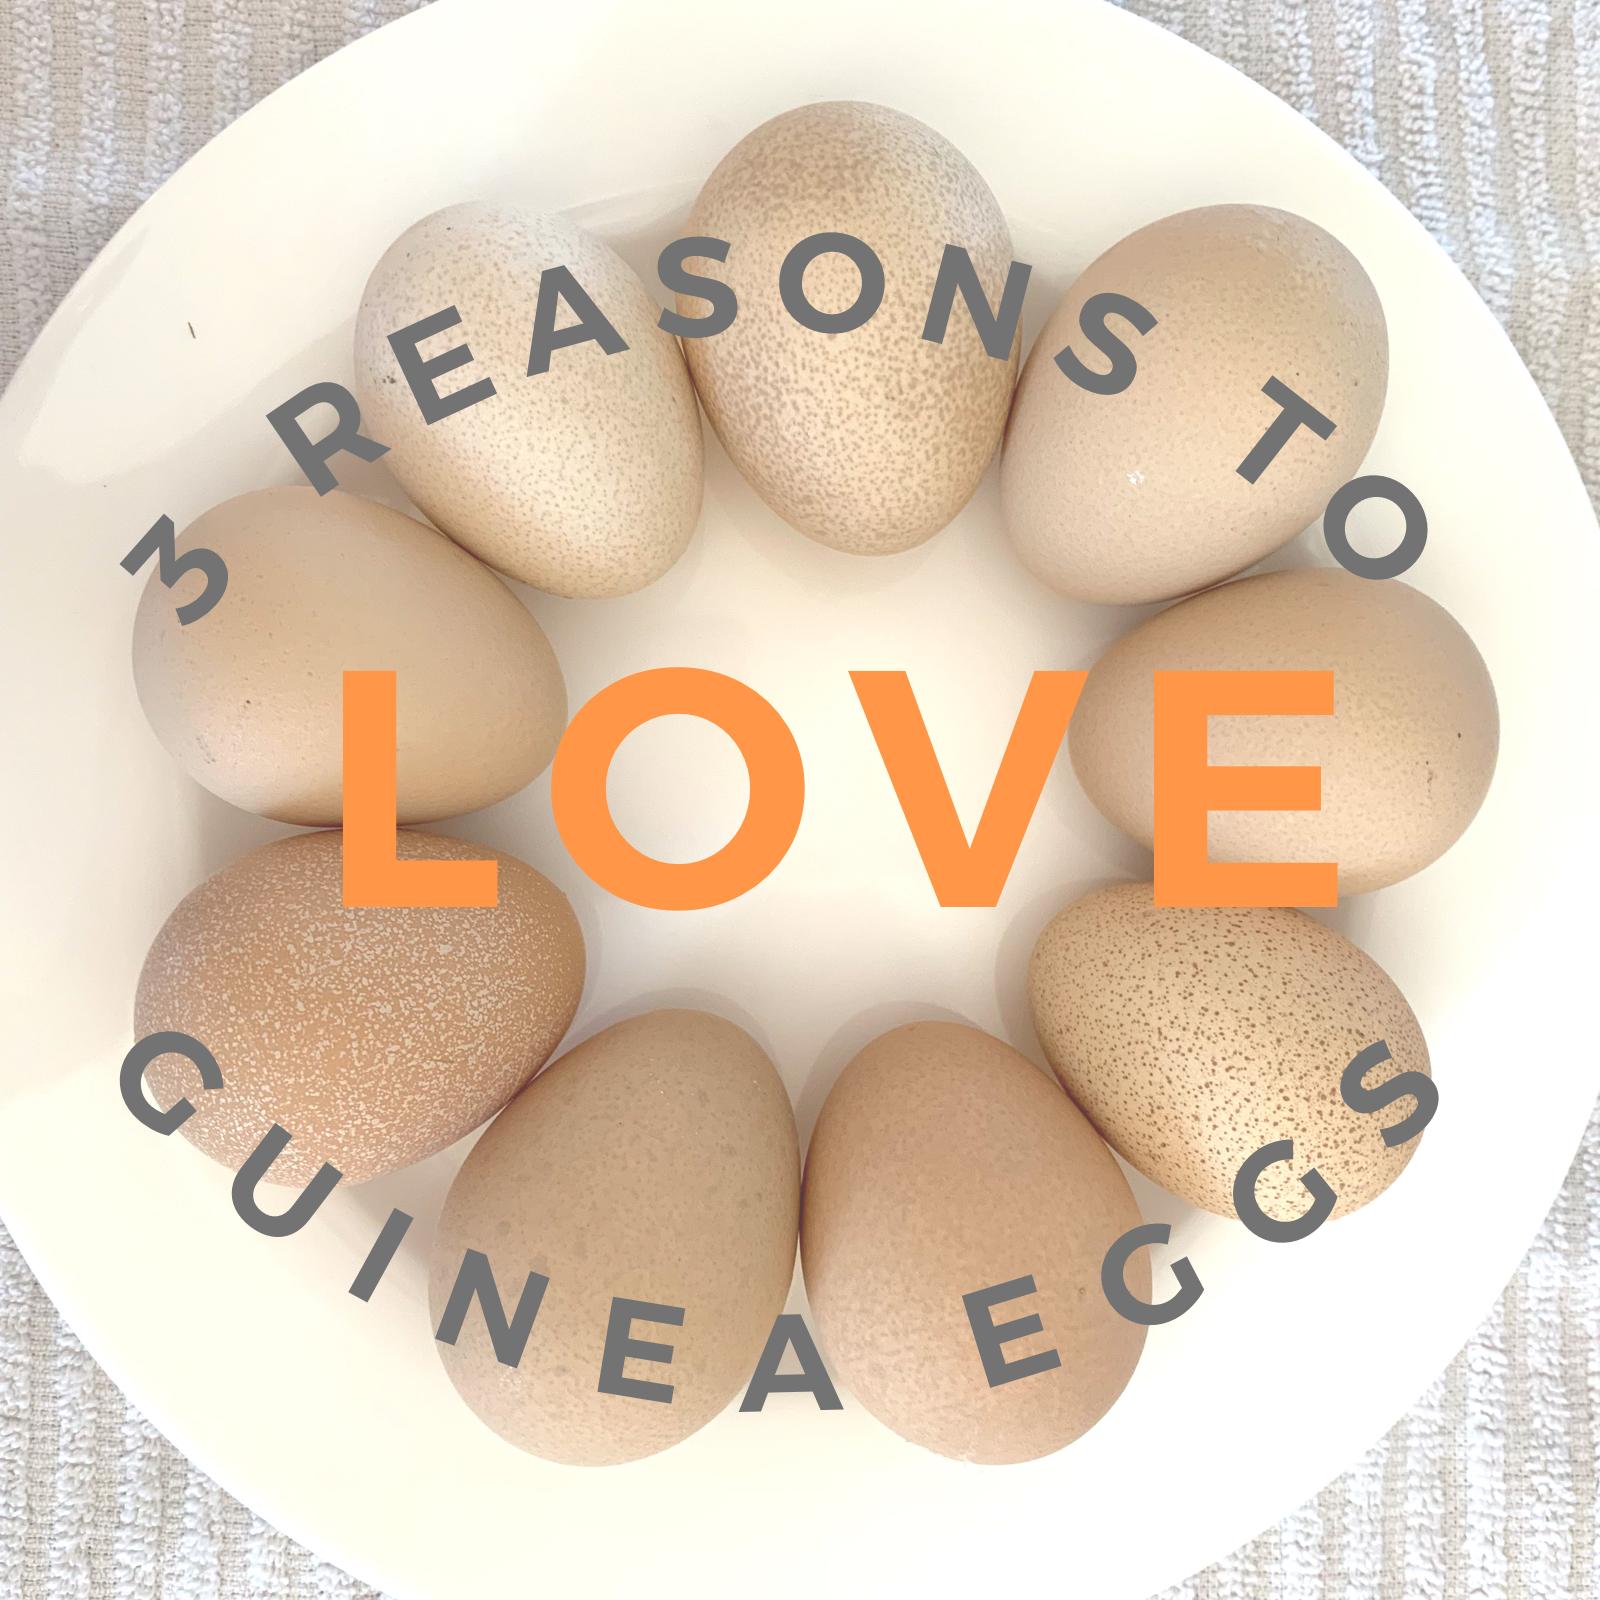 Guinea eggs